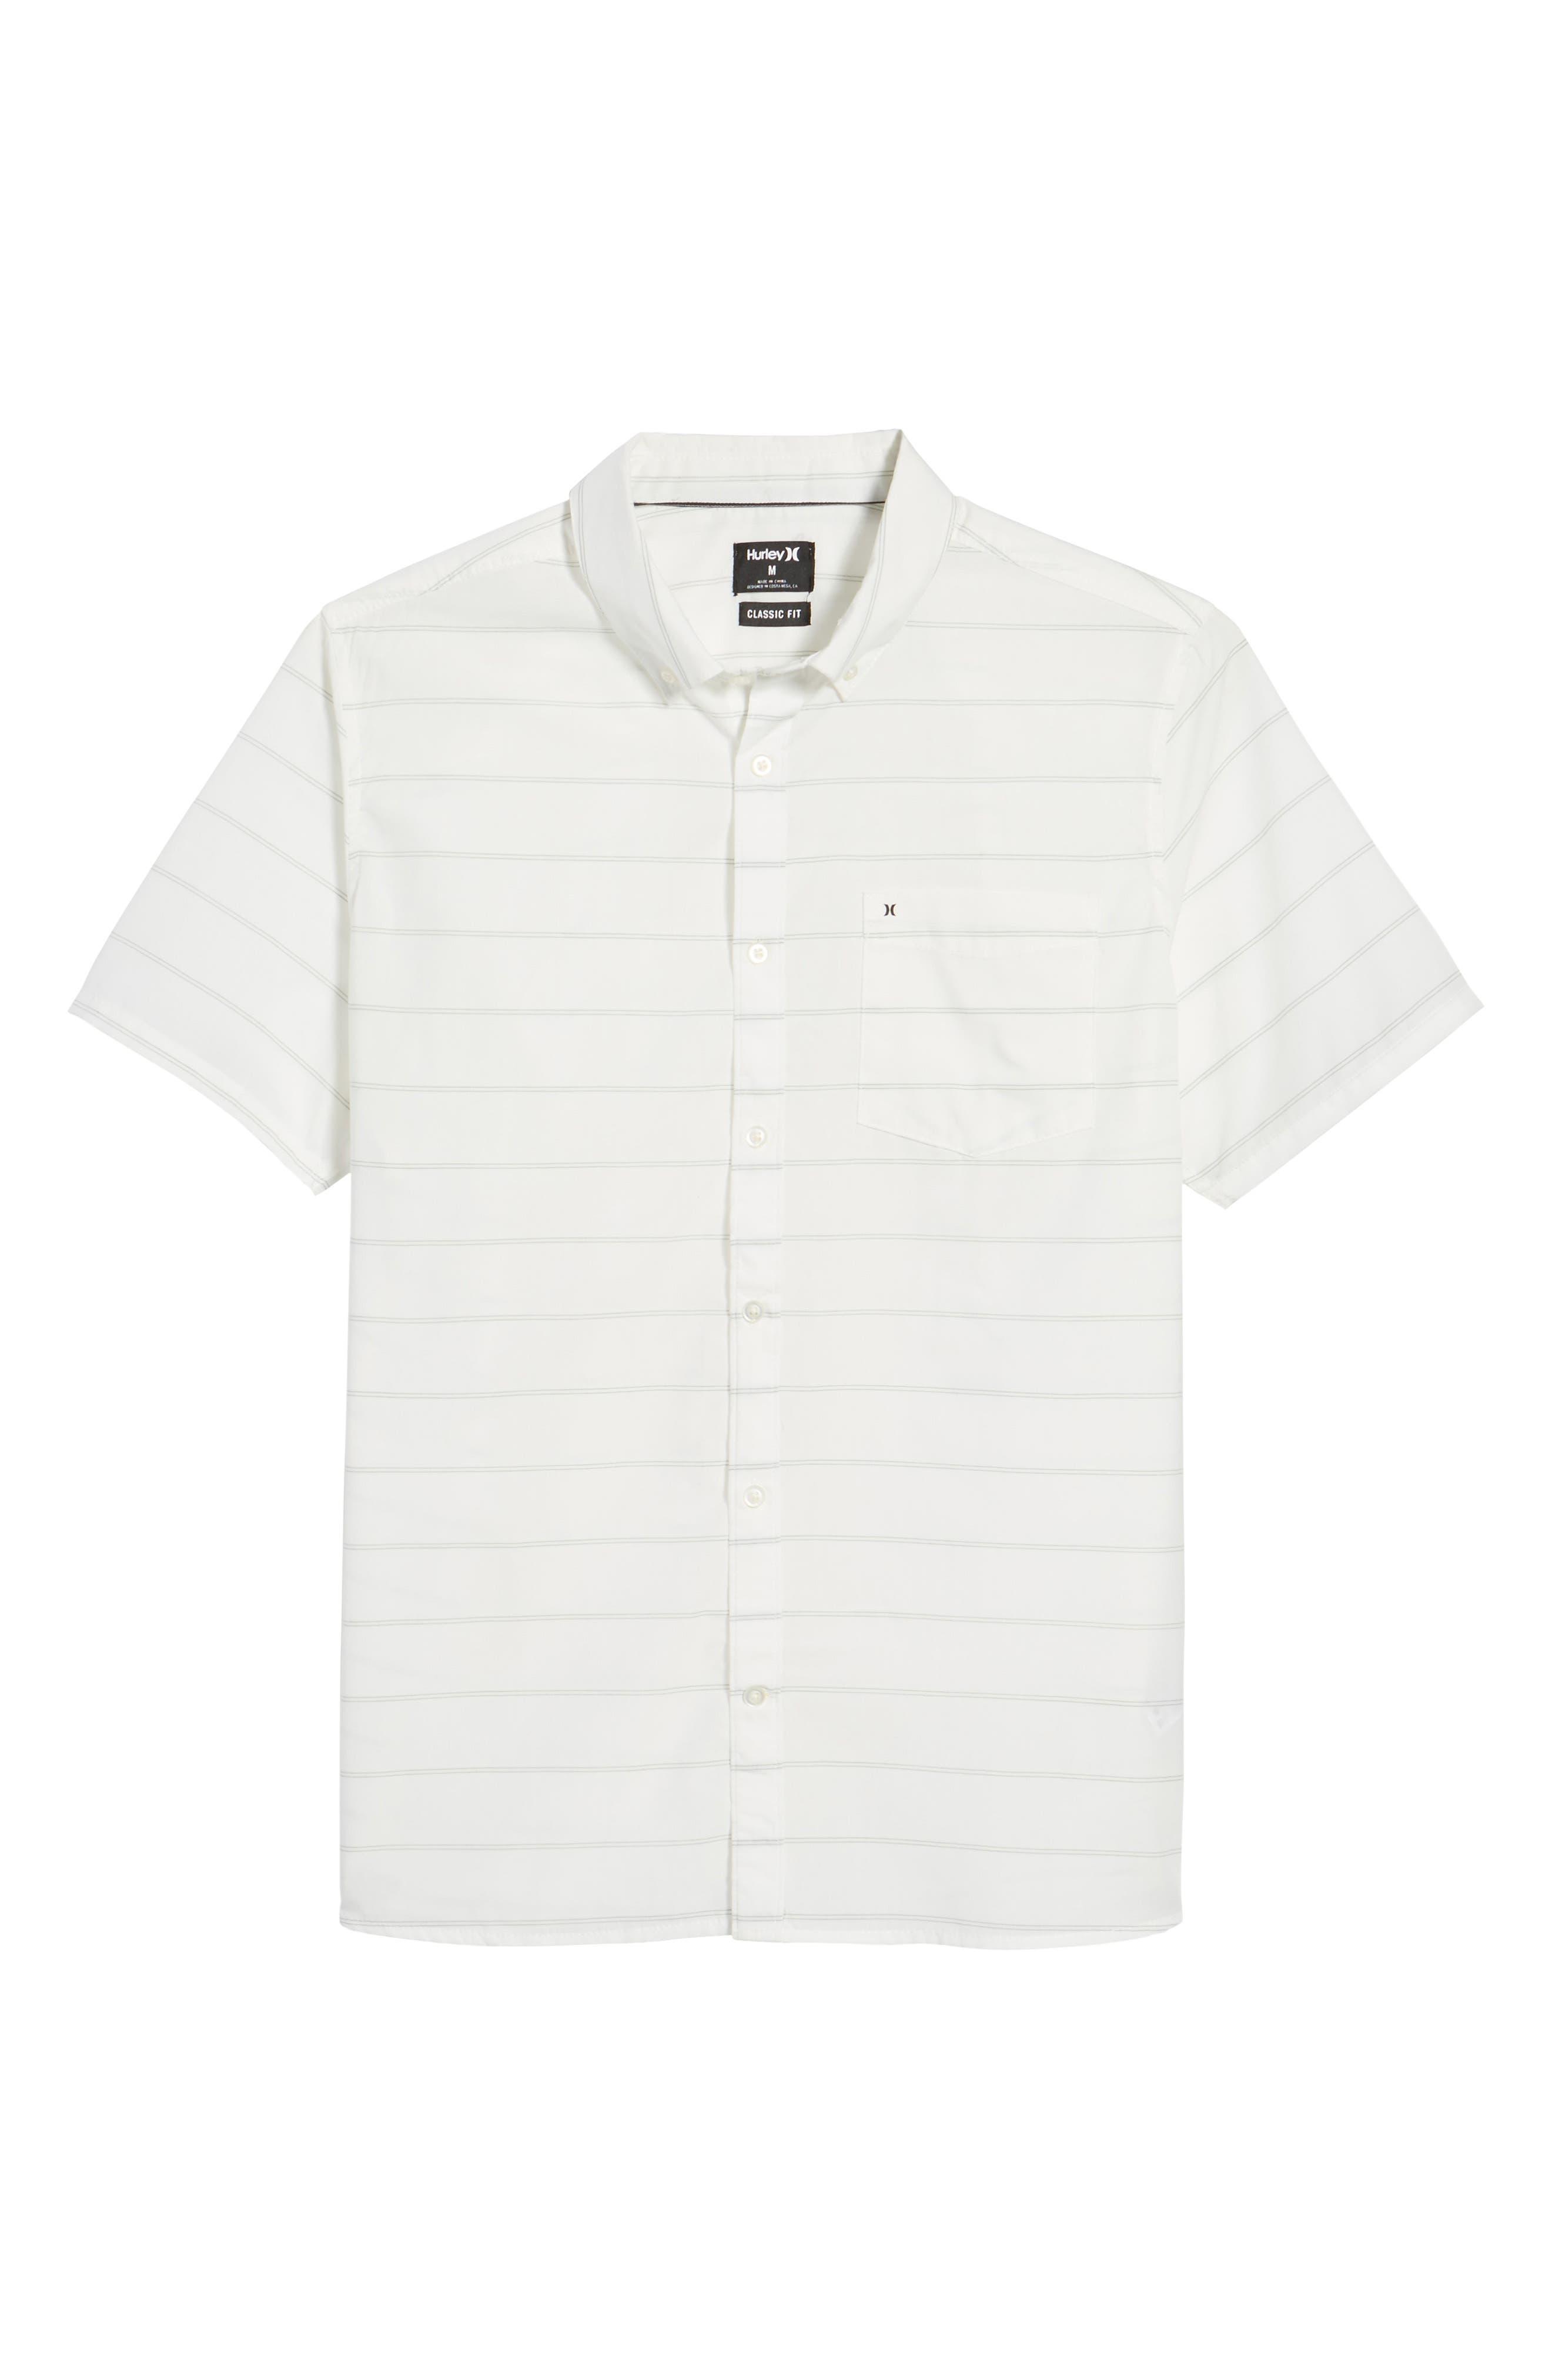 Reeder Dry Woven Shirt,                             Alternate thumbnail 6, color,                             Sail